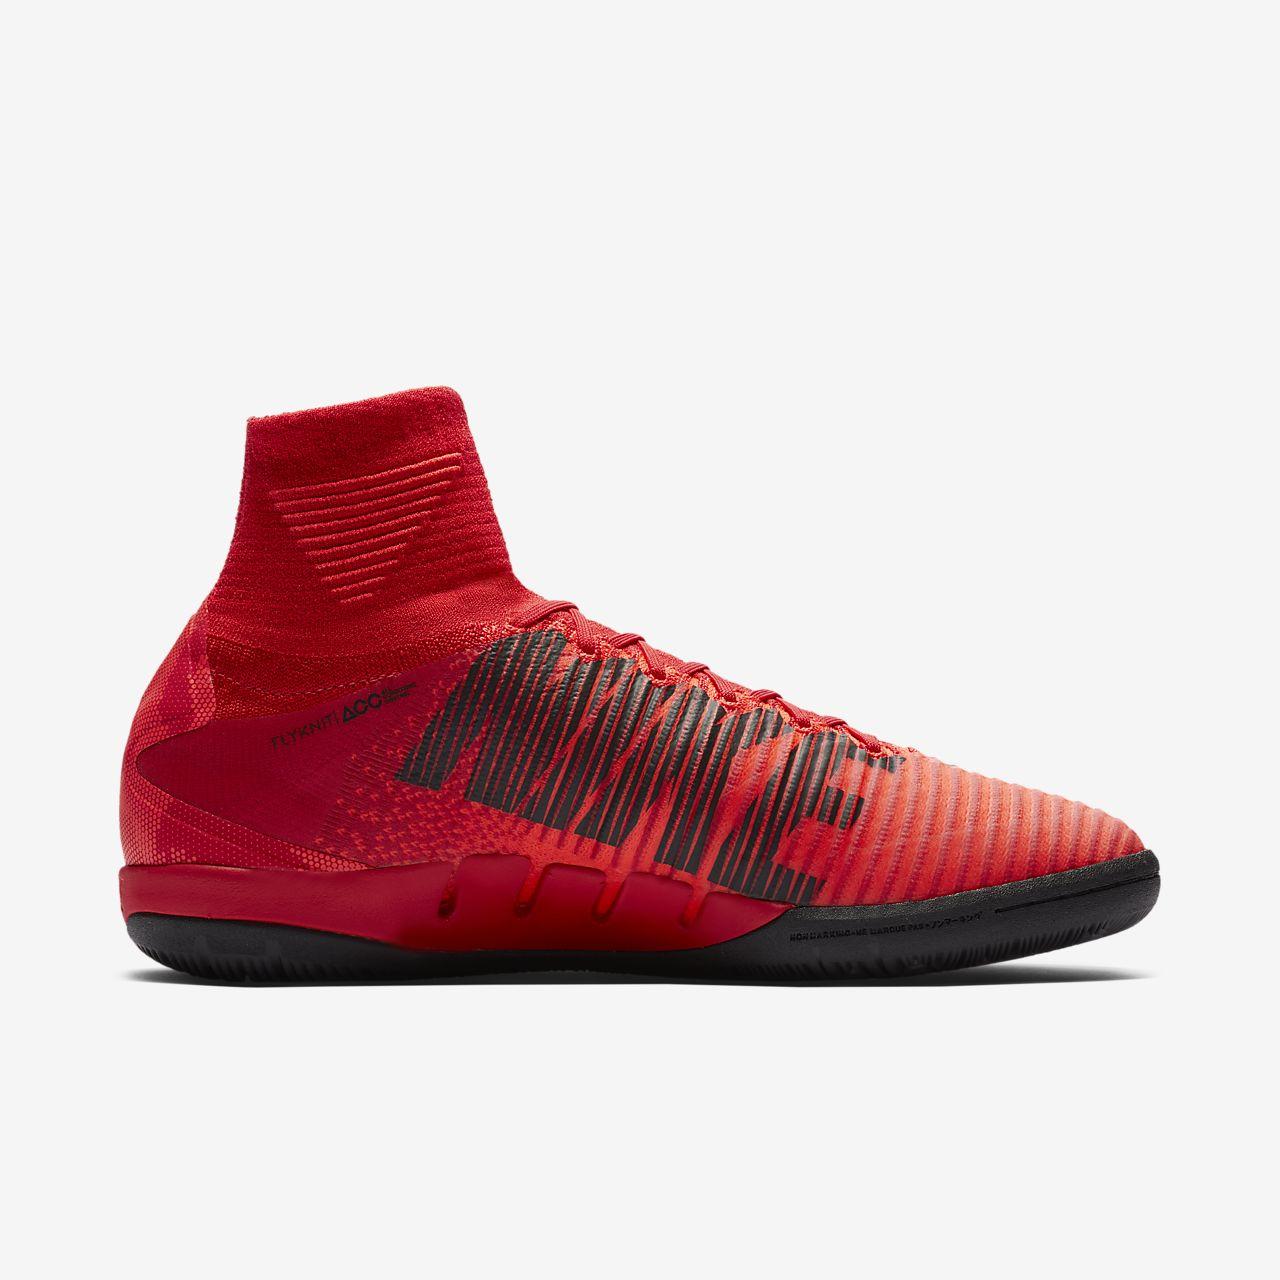 ... Nike MercurialX Proximo II Indoor/Court Football Shoe